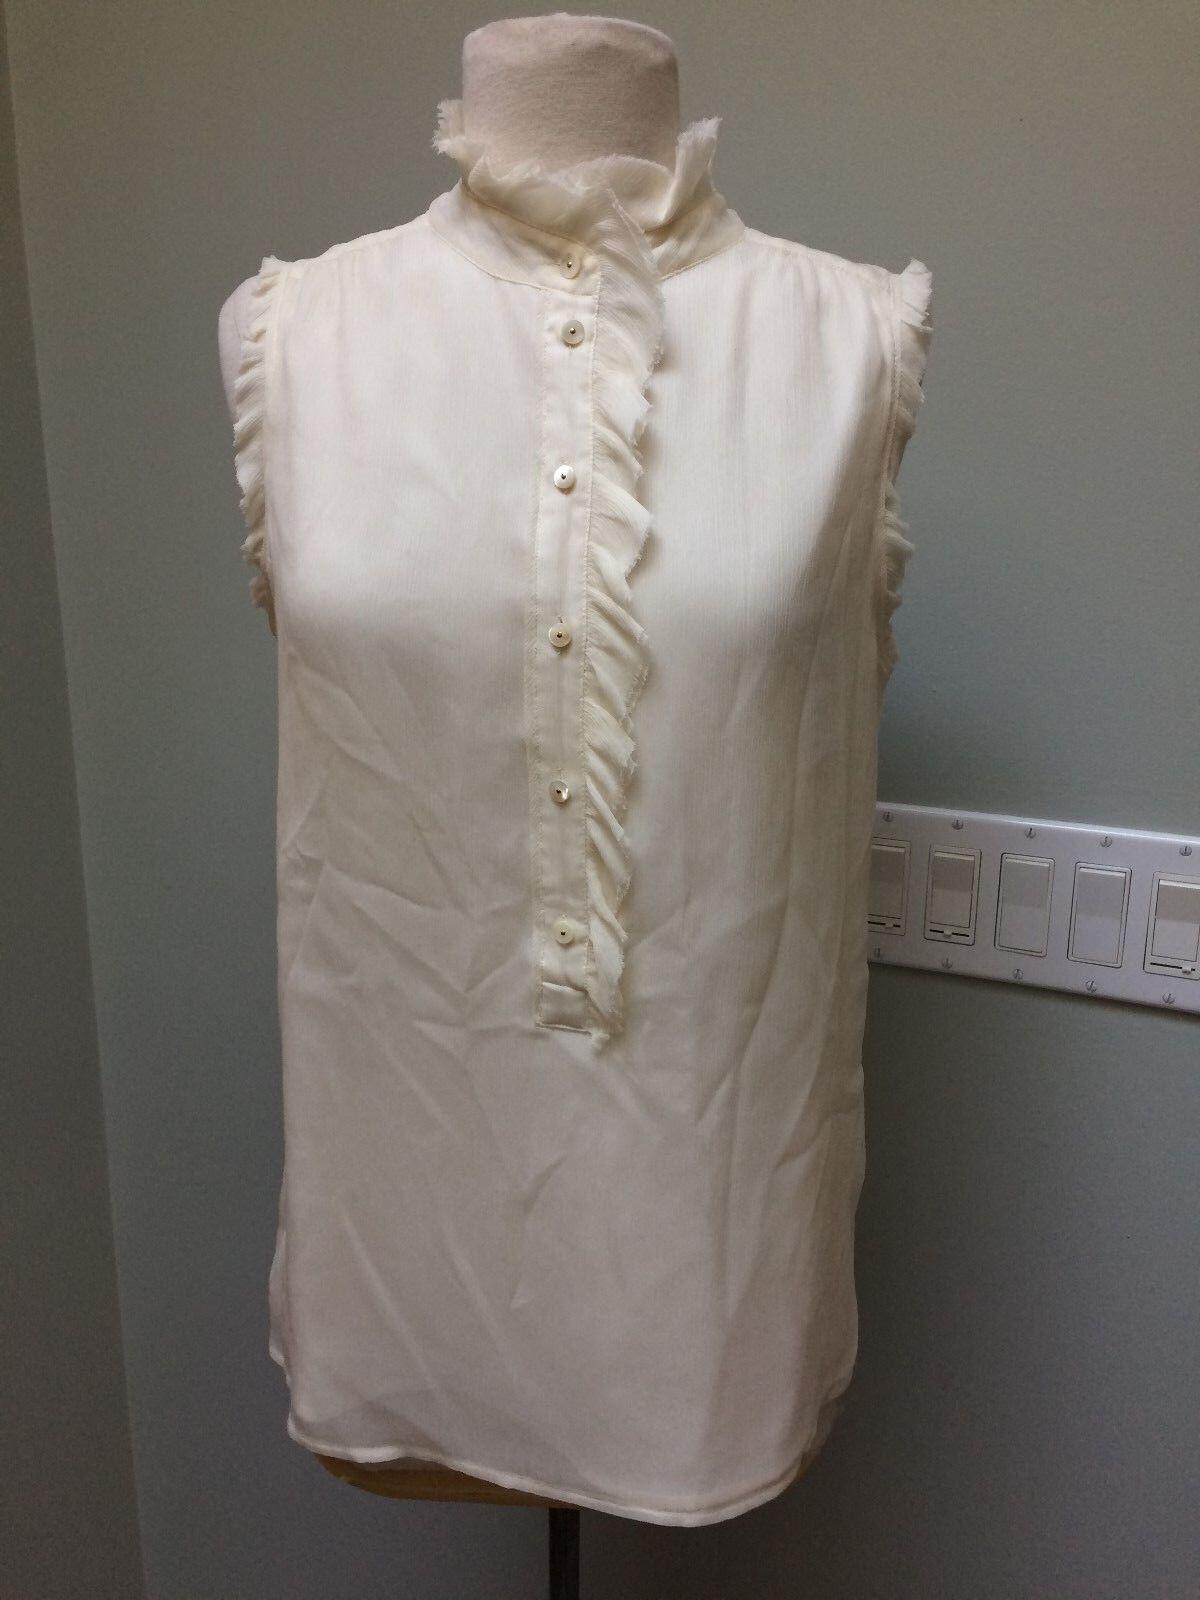 J Crew Sz 4 1 2 Button Sleeveless Shell Blouse Ivory 100% Silk Ruffles